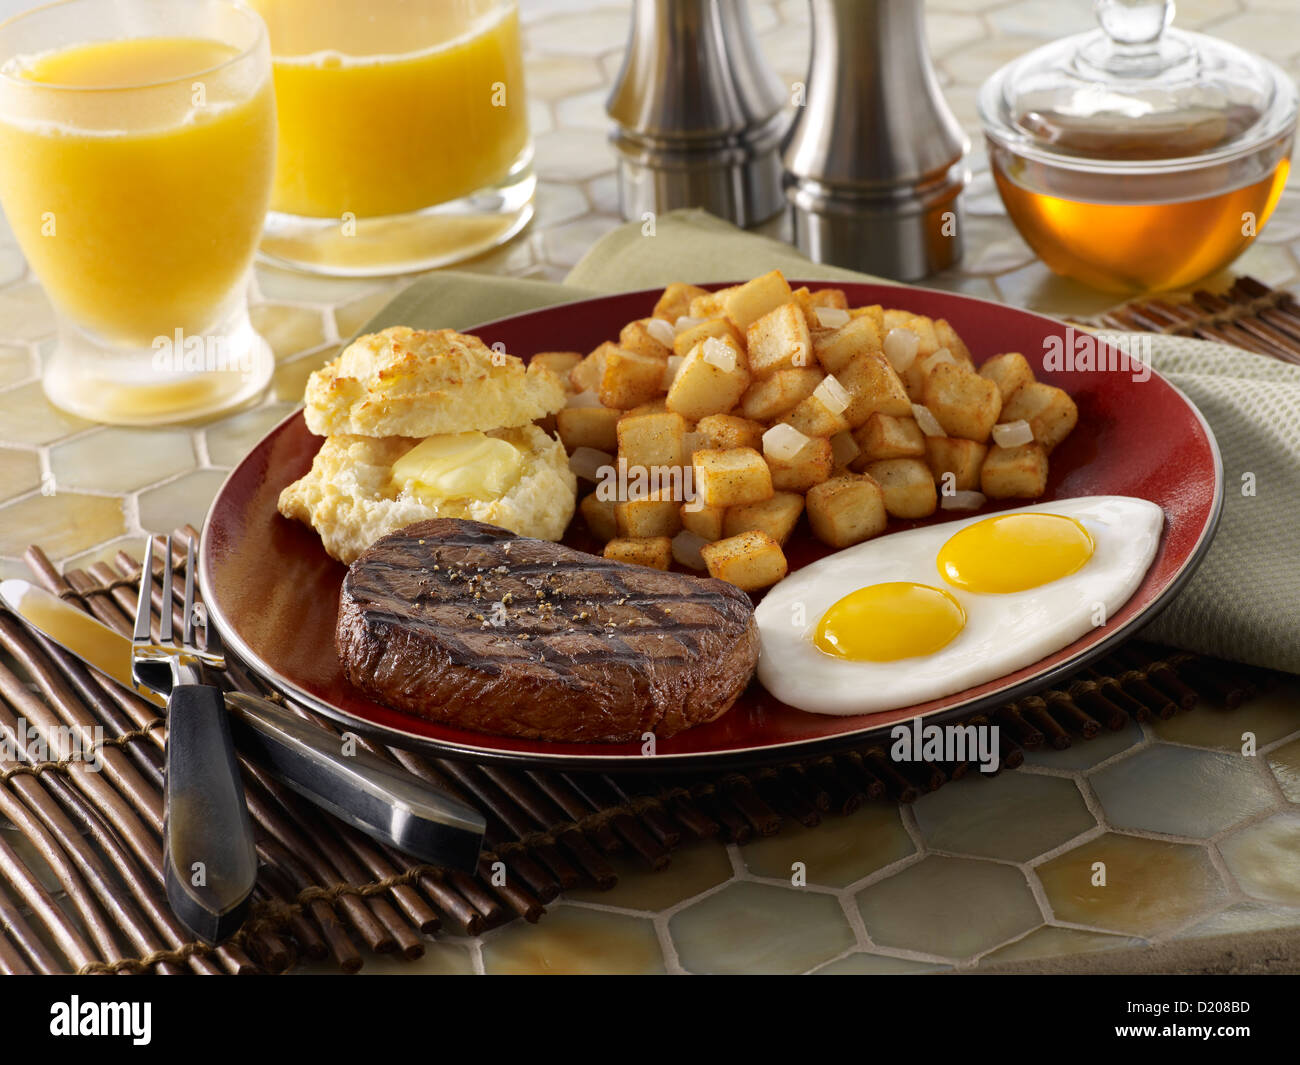 Steak and Eggs Breakfast - Stock Image